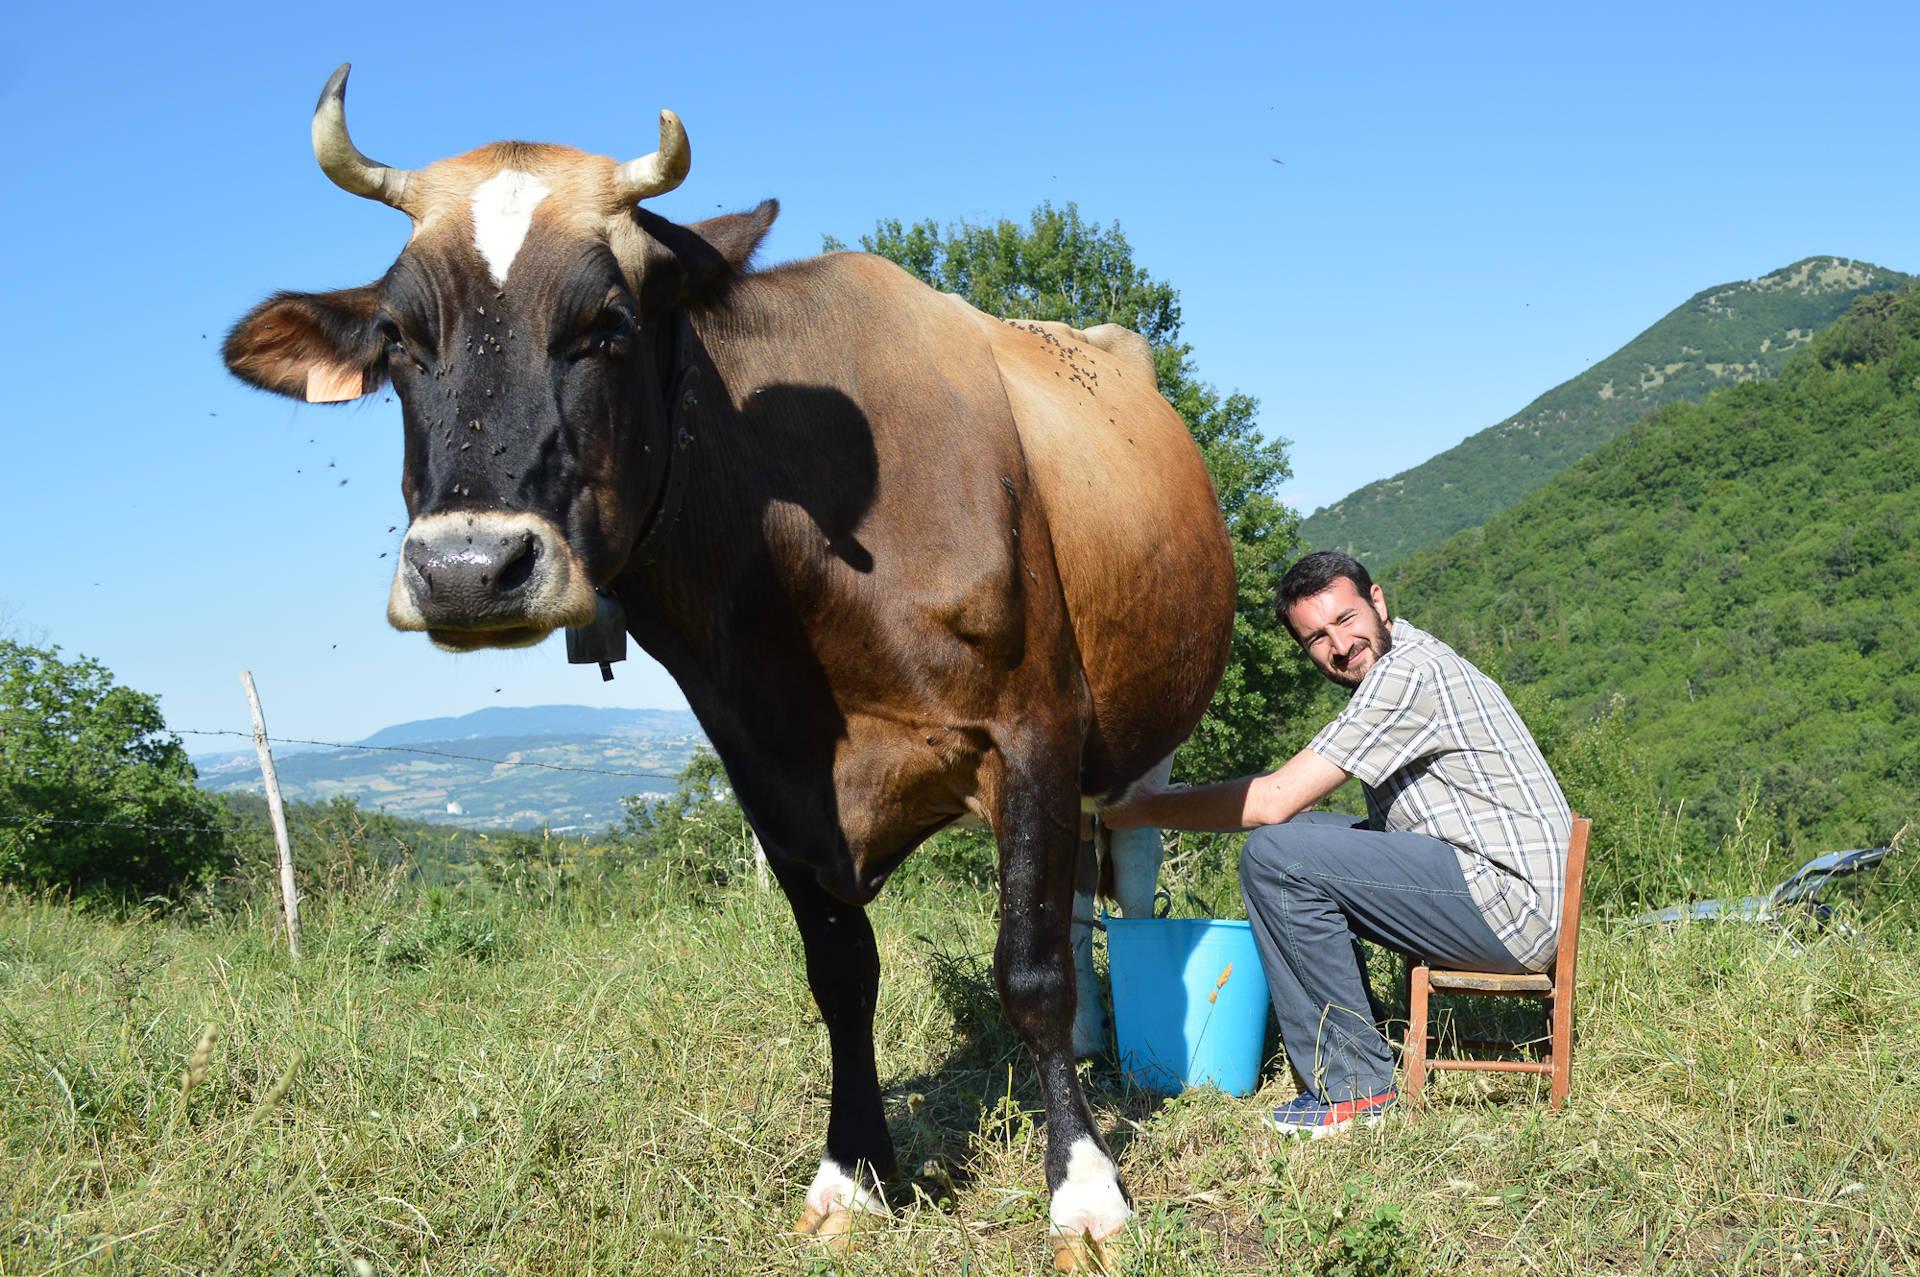 turismo esperienziale molise mucca